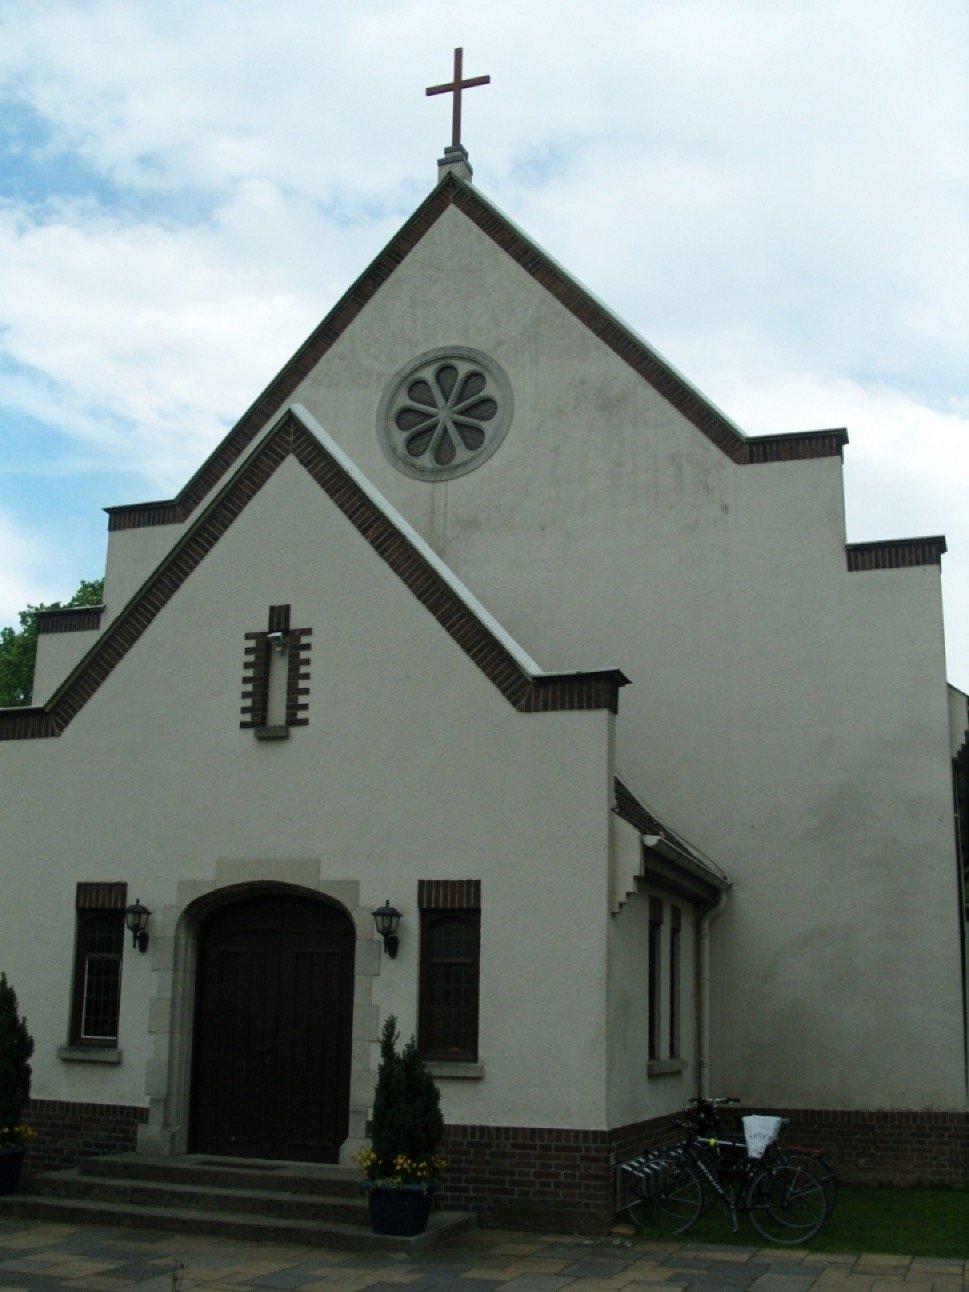 Gable of church building